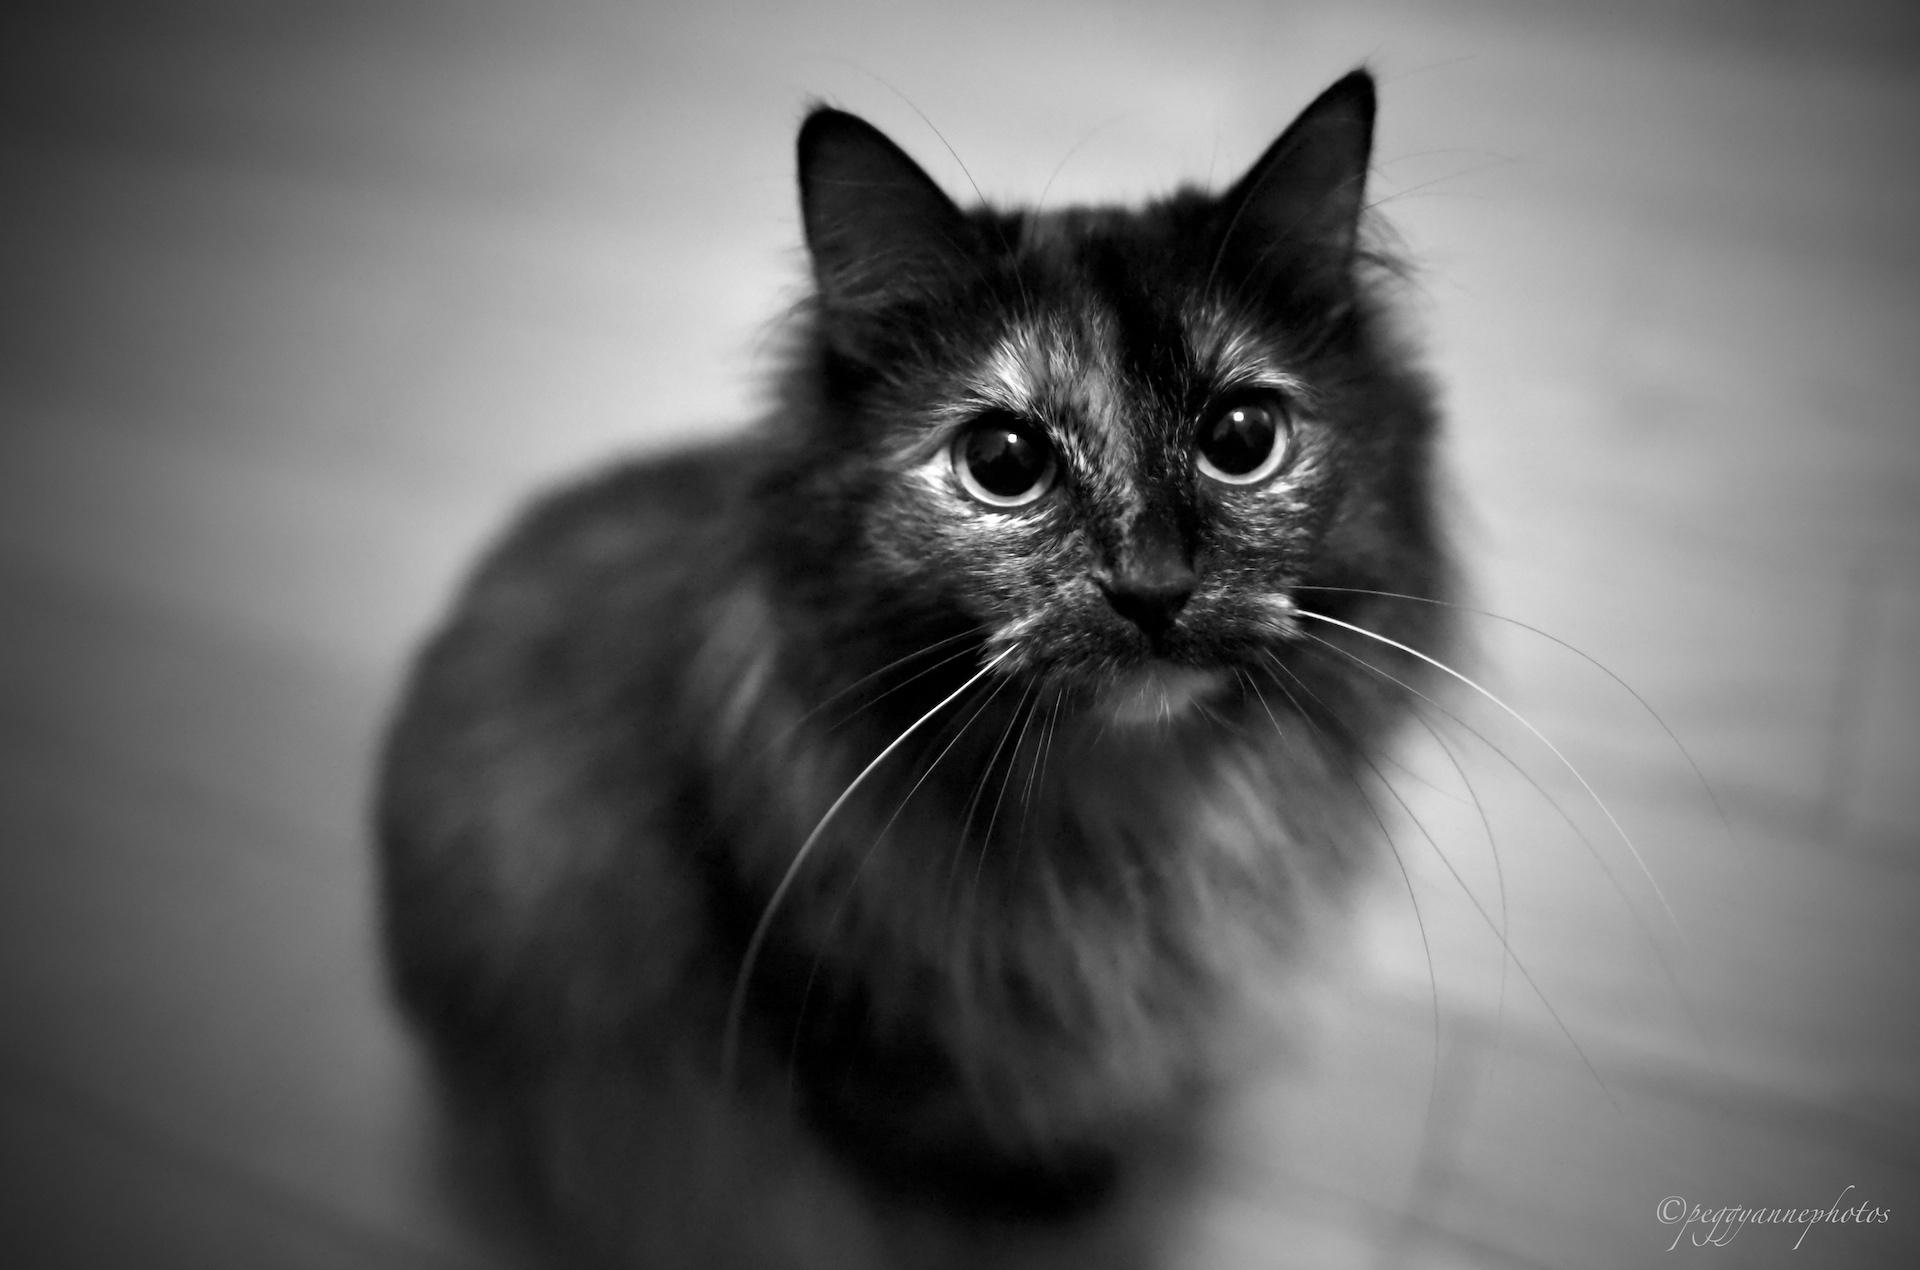 2019_05_14 Shaneys cats PCSmall06.JPG